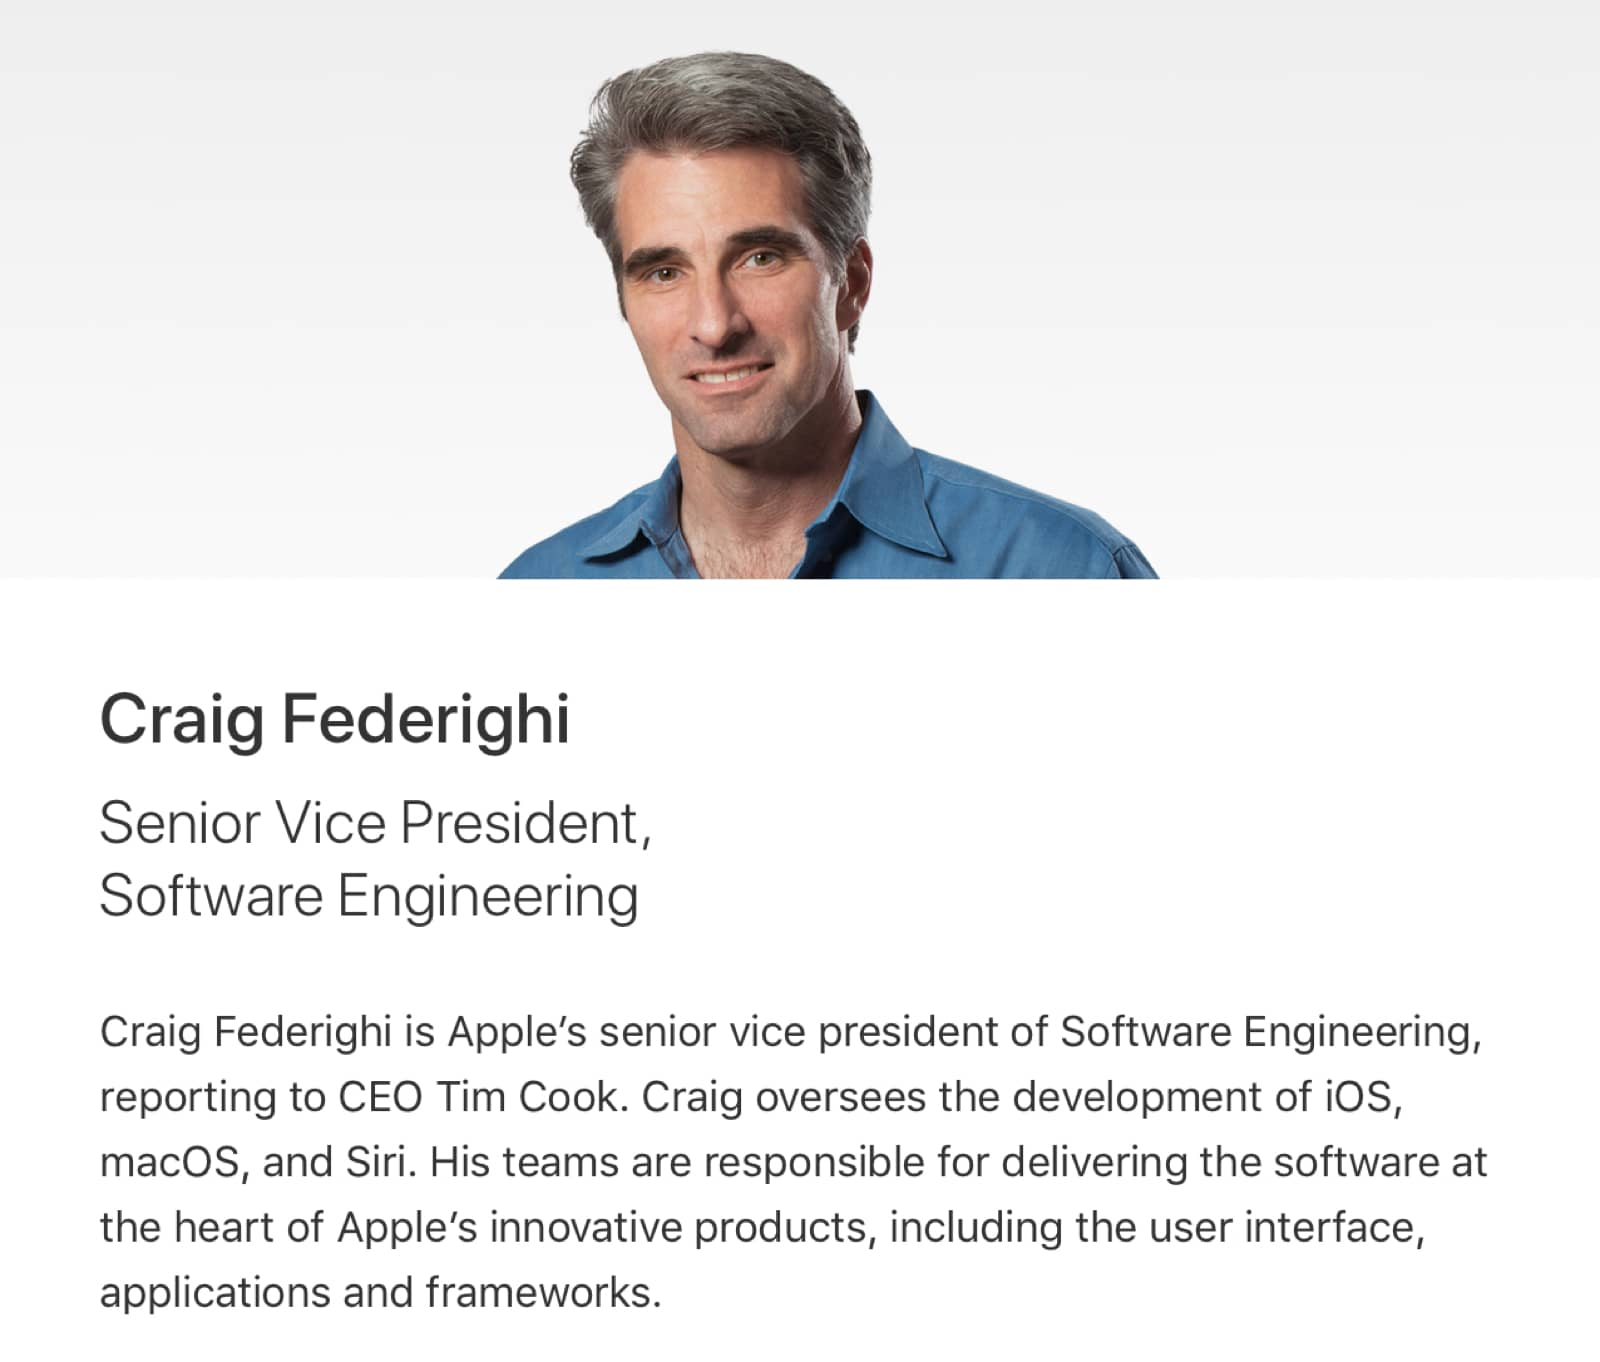 Craig's new bio page says he leads the Siri team.